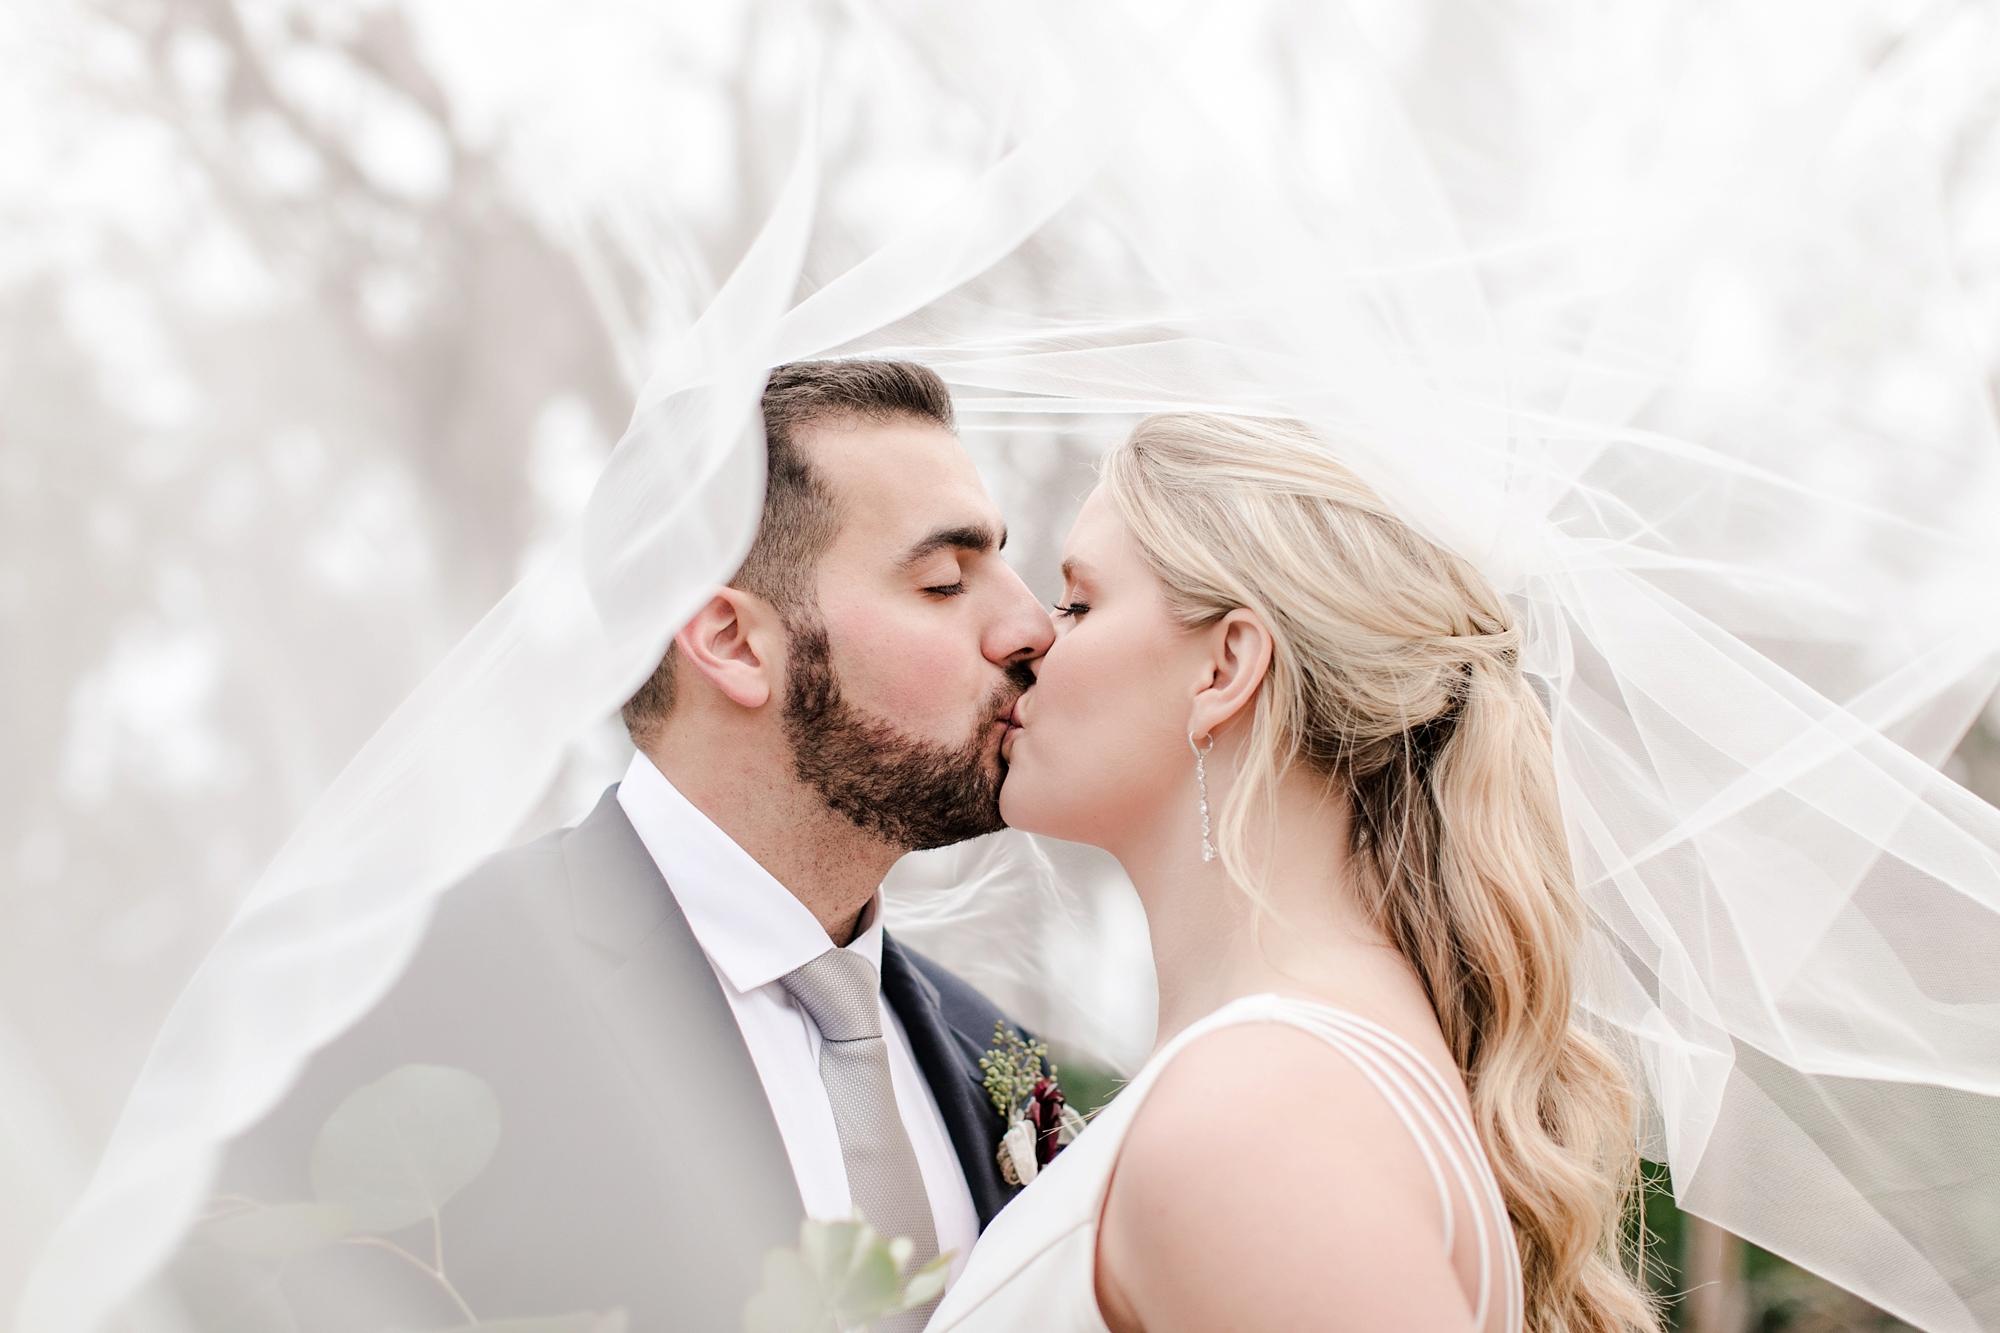 Natalie Broach Photography | Channel Side | Palm Coast Wedding Photographer | North Florida Wedding Photographer | Jacksonville Wedding Photographer | Destination Wedding Photographer